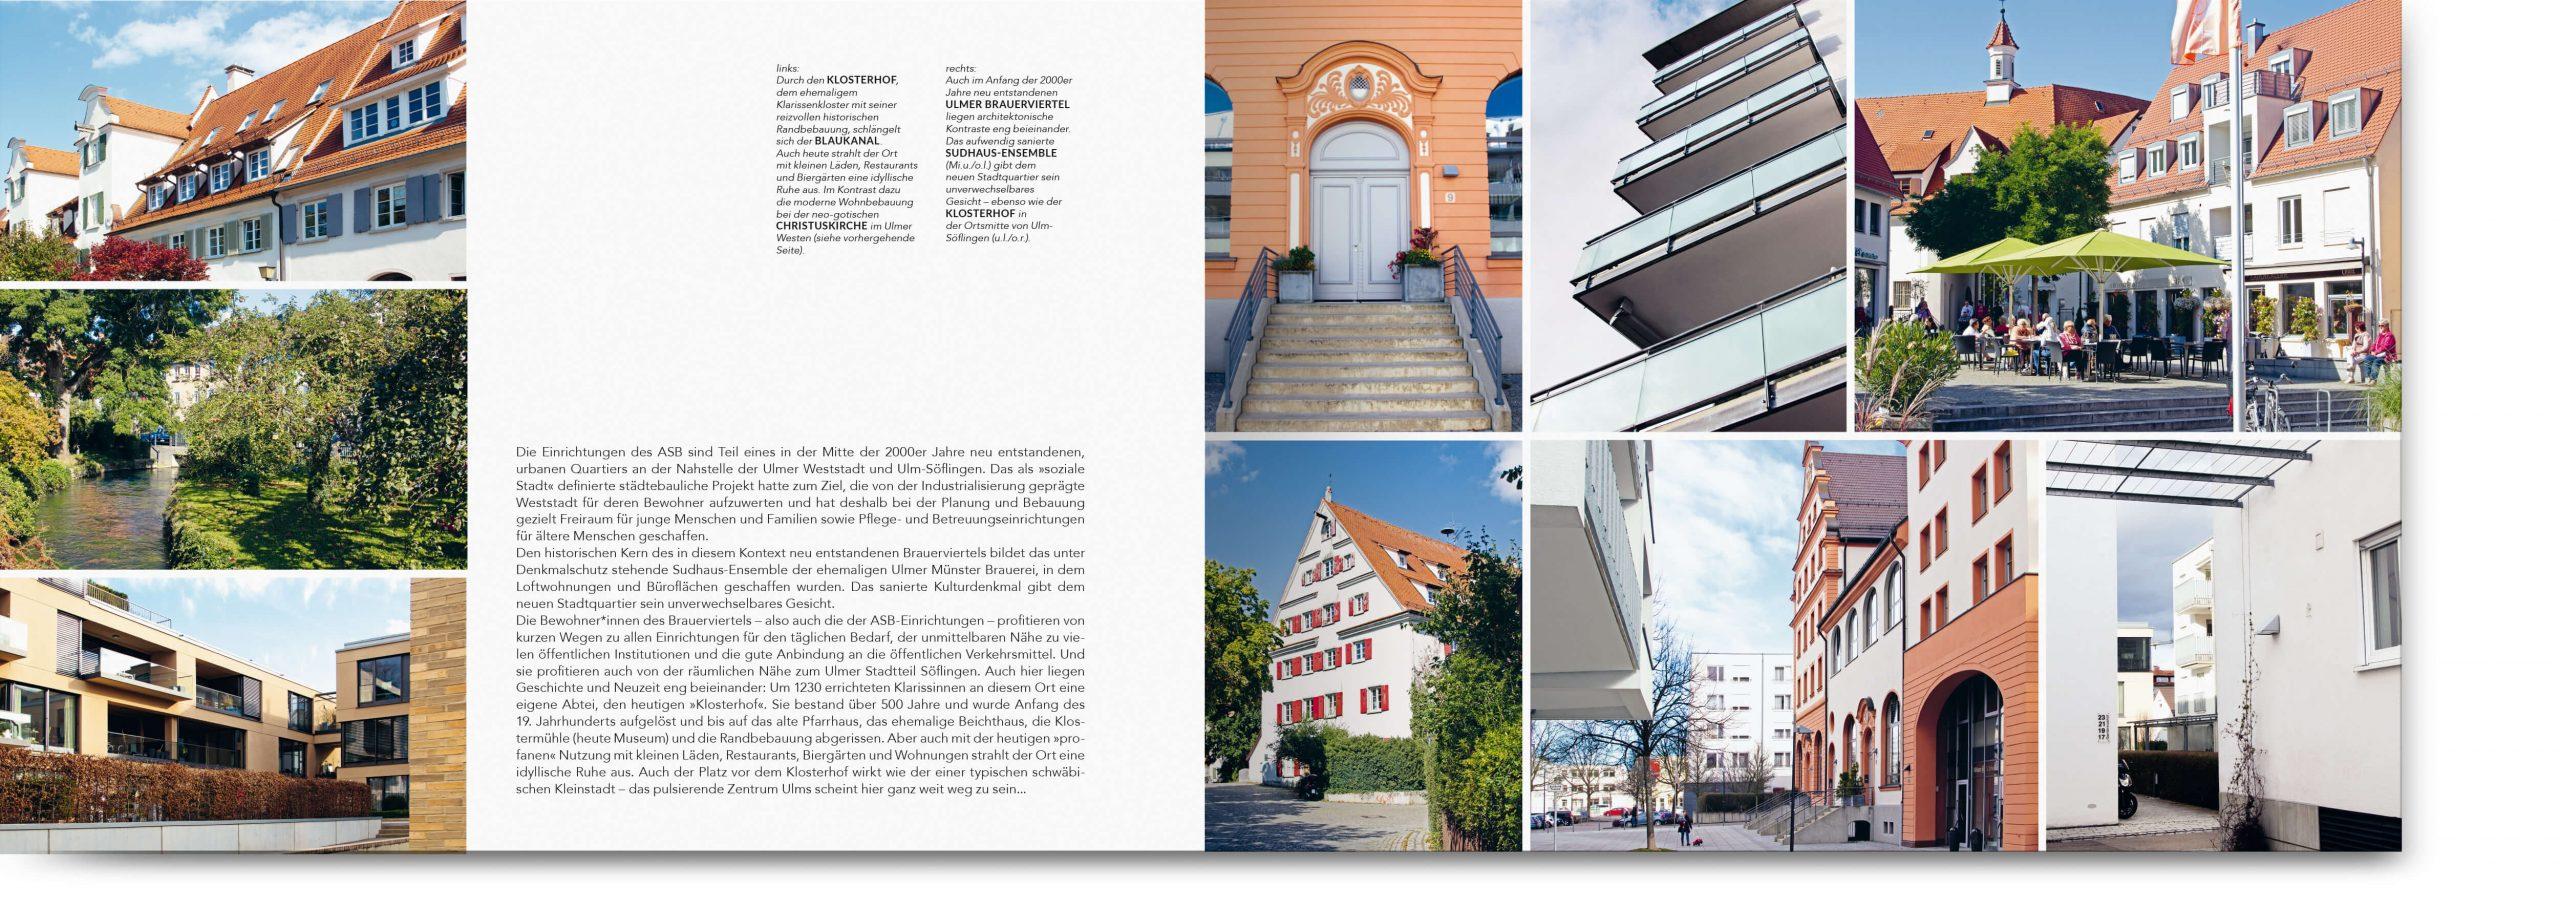 fh-web-asb-broschüren-ulm-3-scaled.jpg